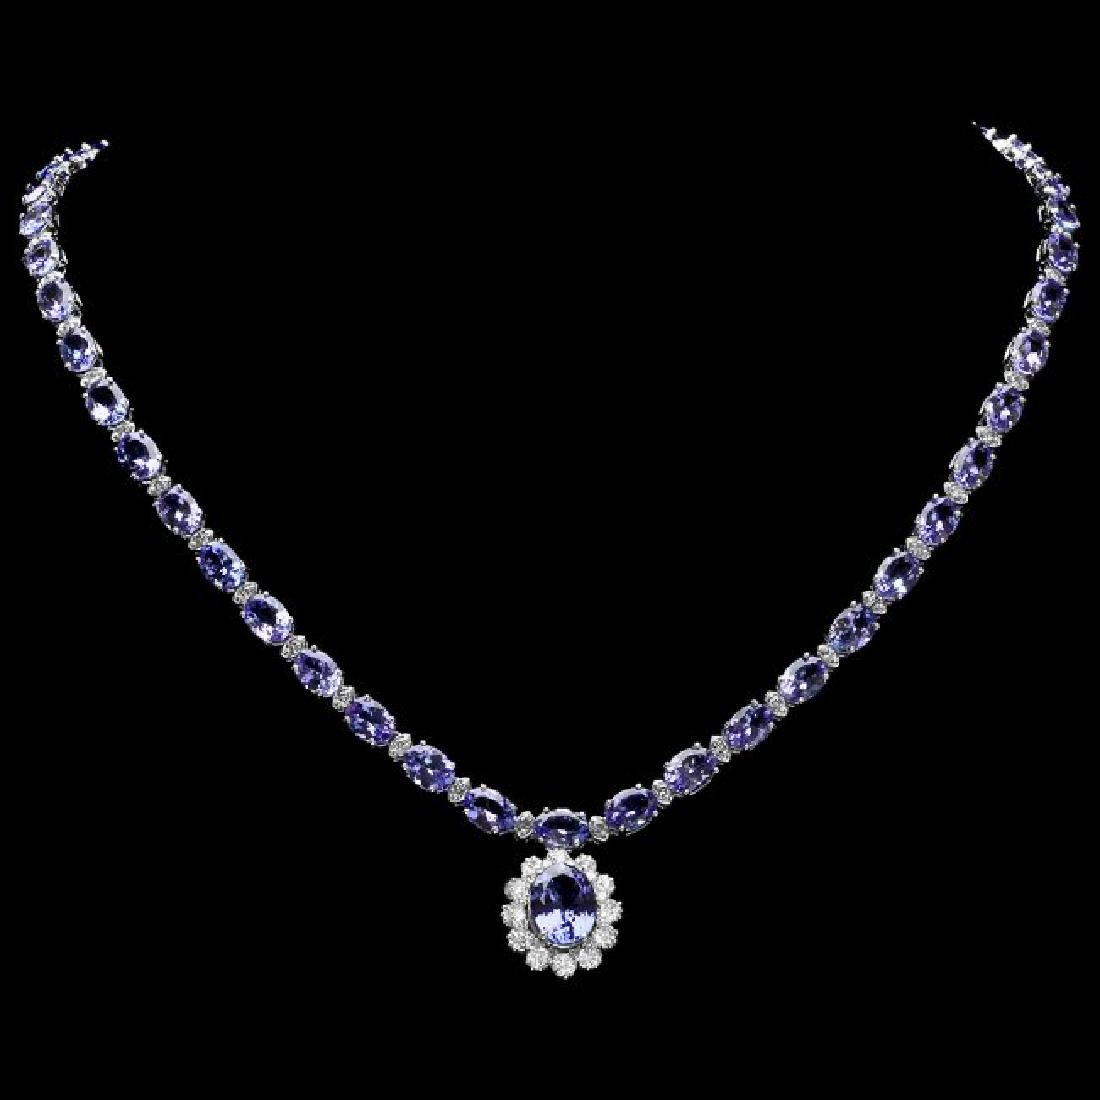 14k Gold 35ct Tanzanite 3.30ct Diamond Necklace - 2